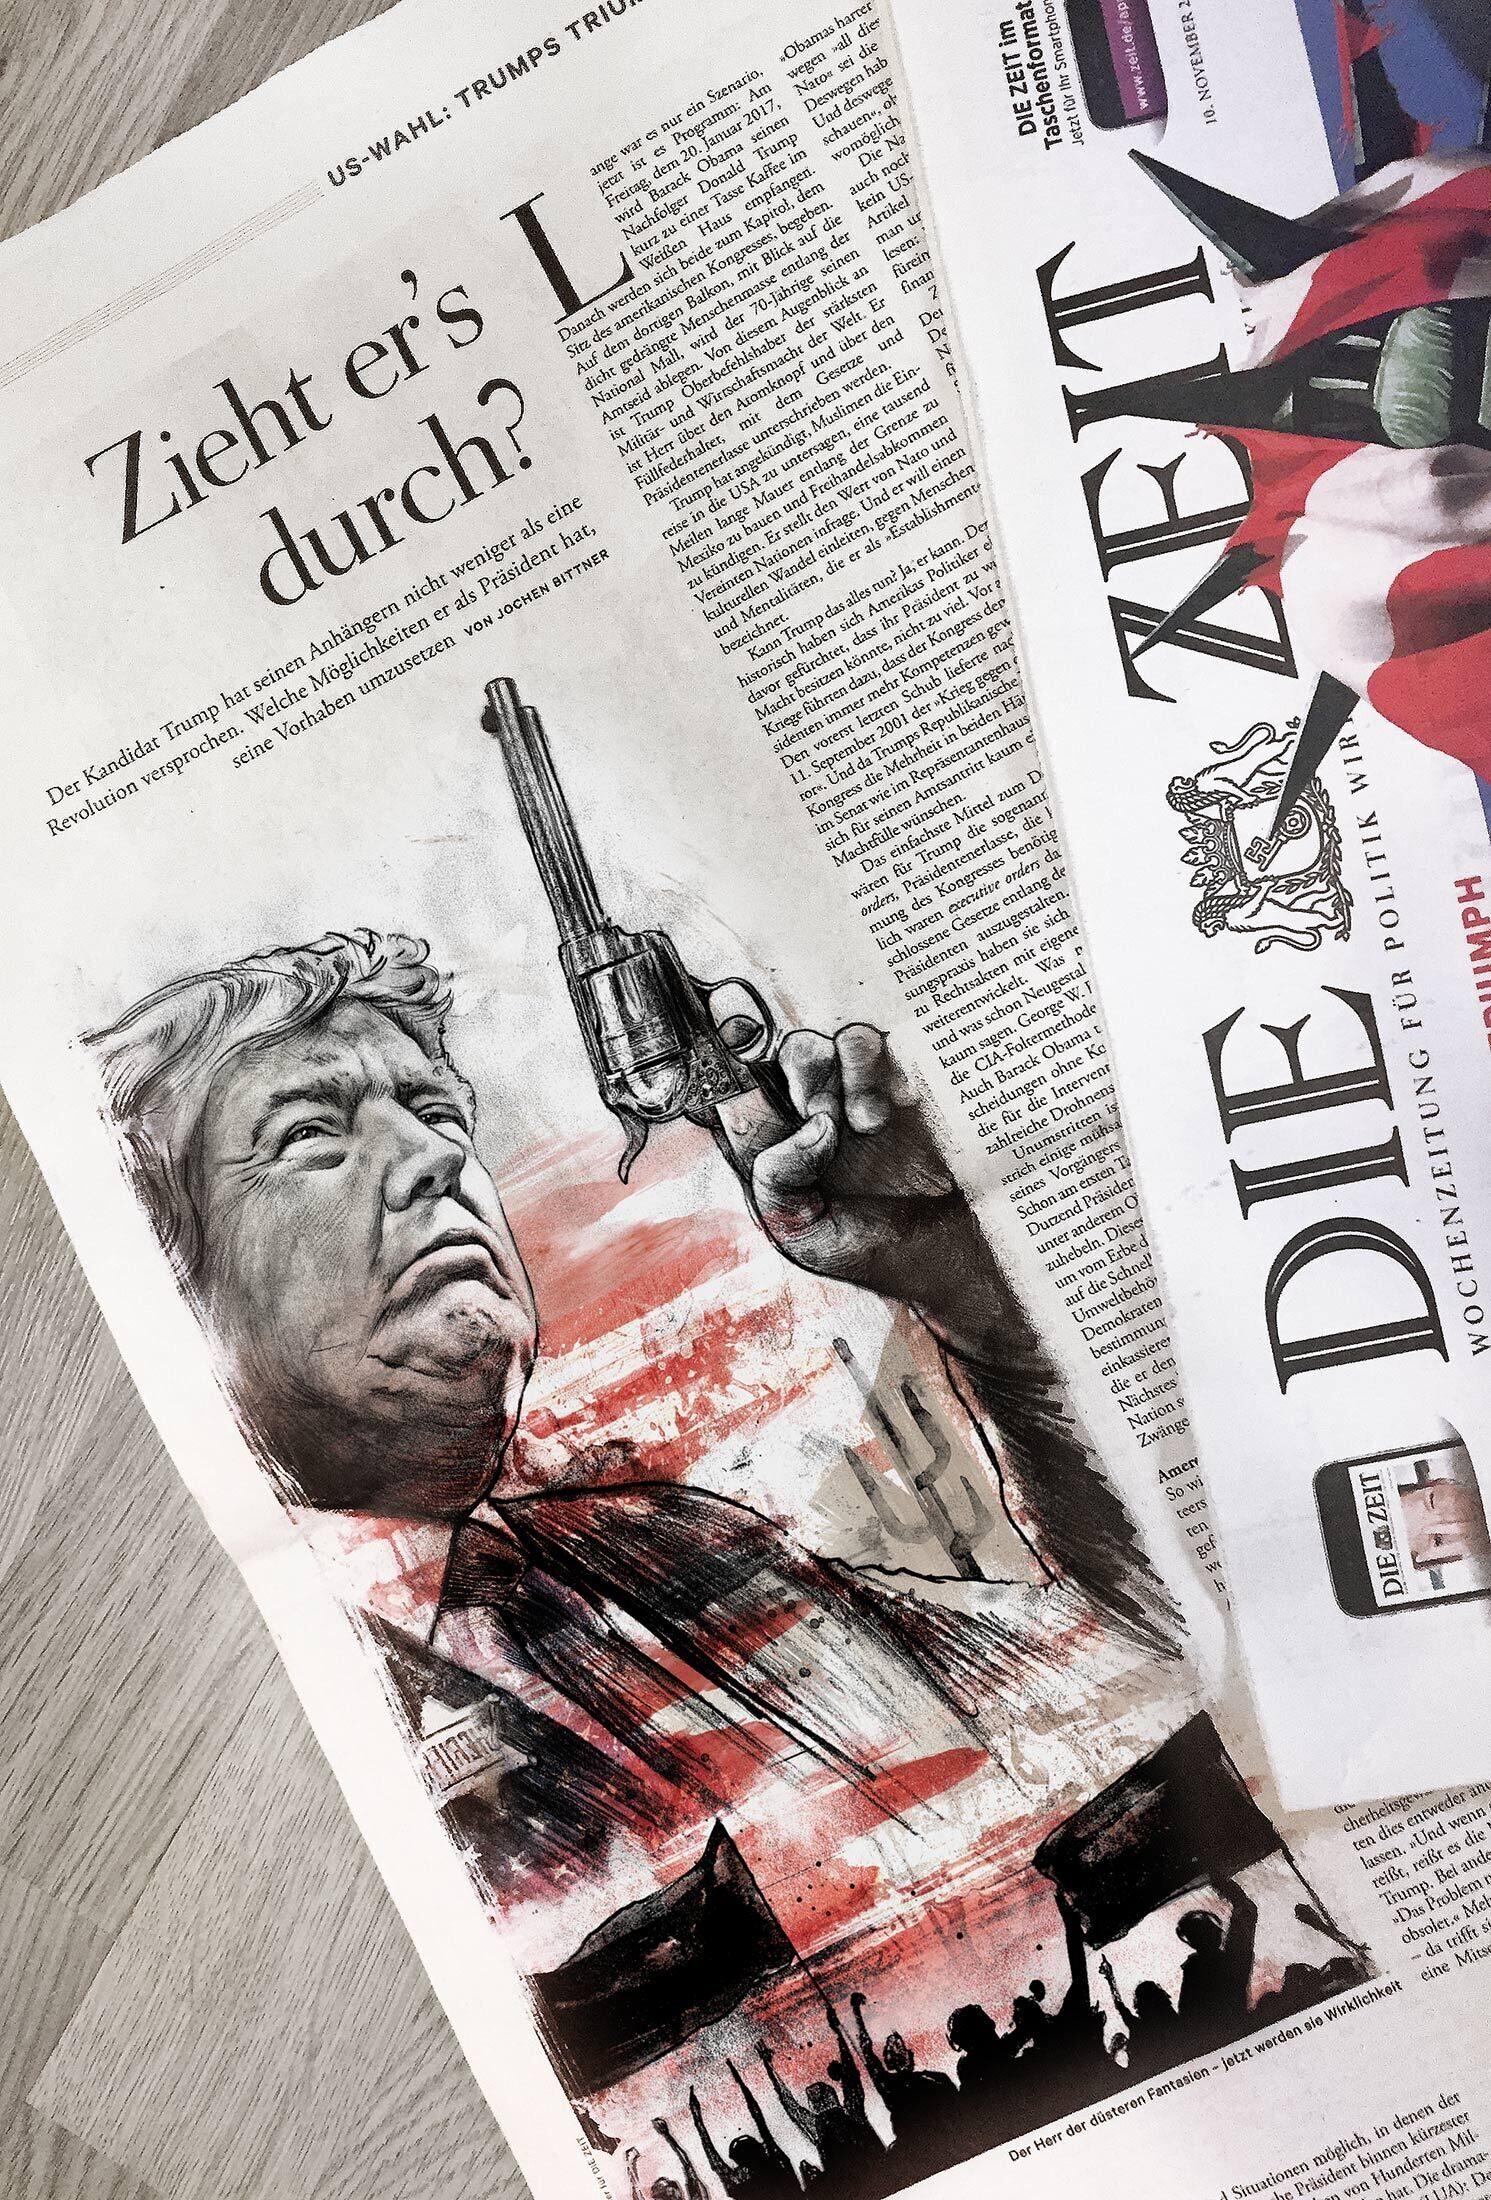 Editorial illustration die zeit donald trump sheriff - Kornel Illustration | Kornel Stadler portfolio